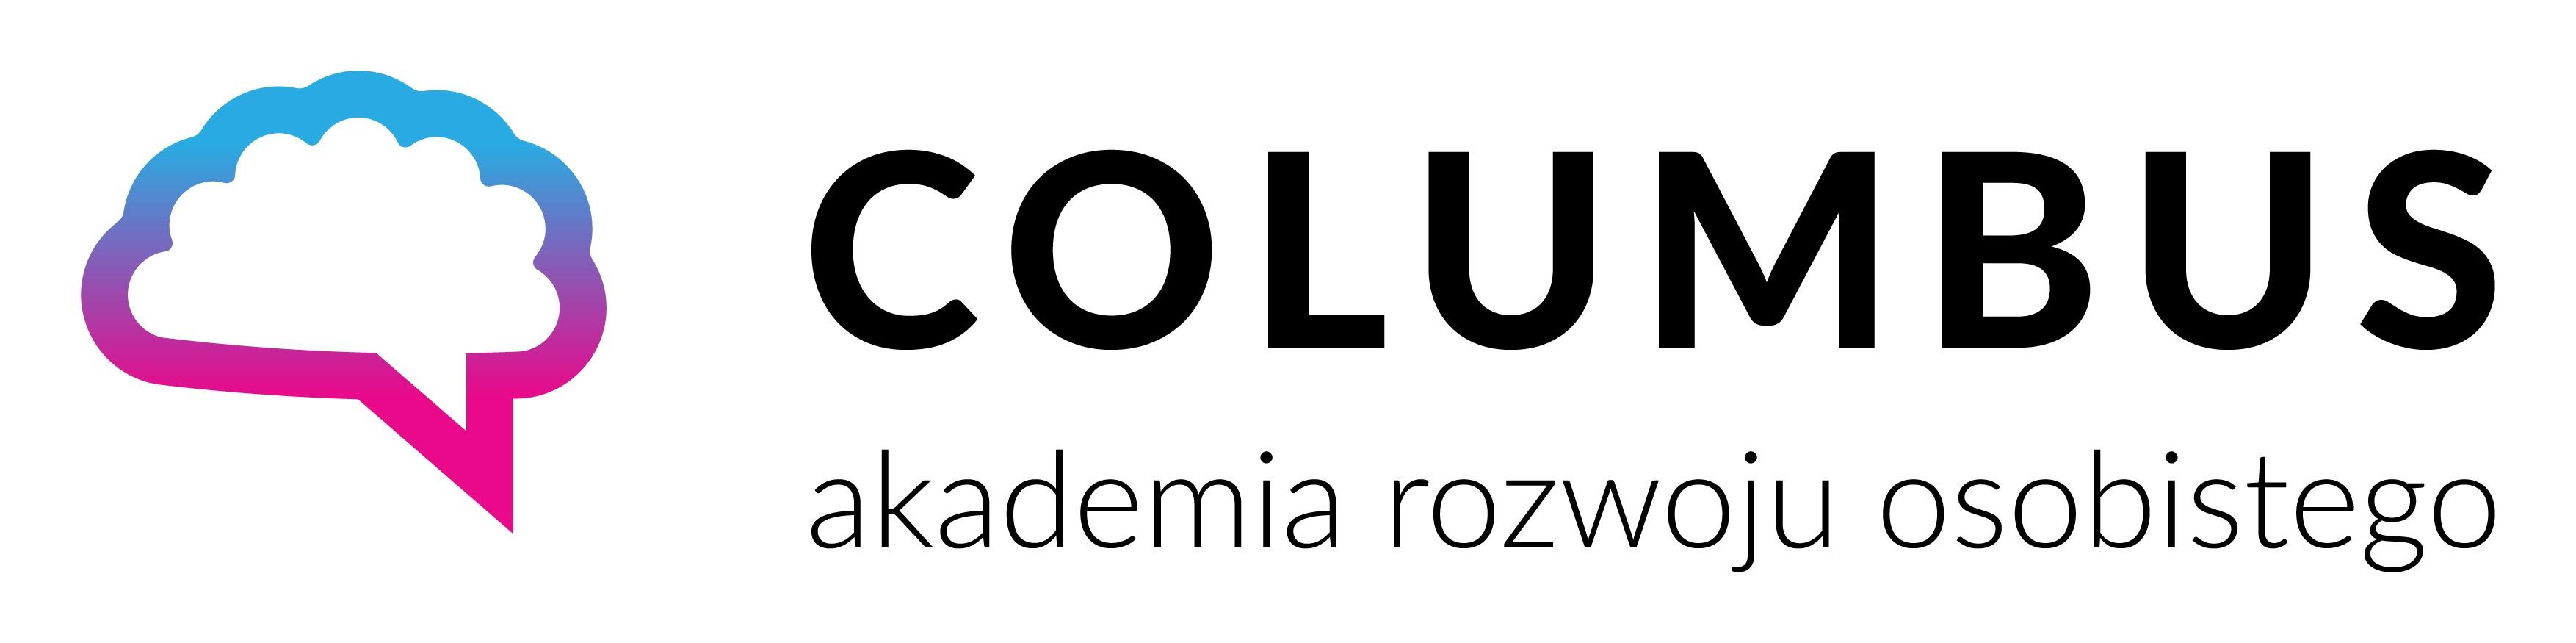 https://akademiacolumbus.pl/